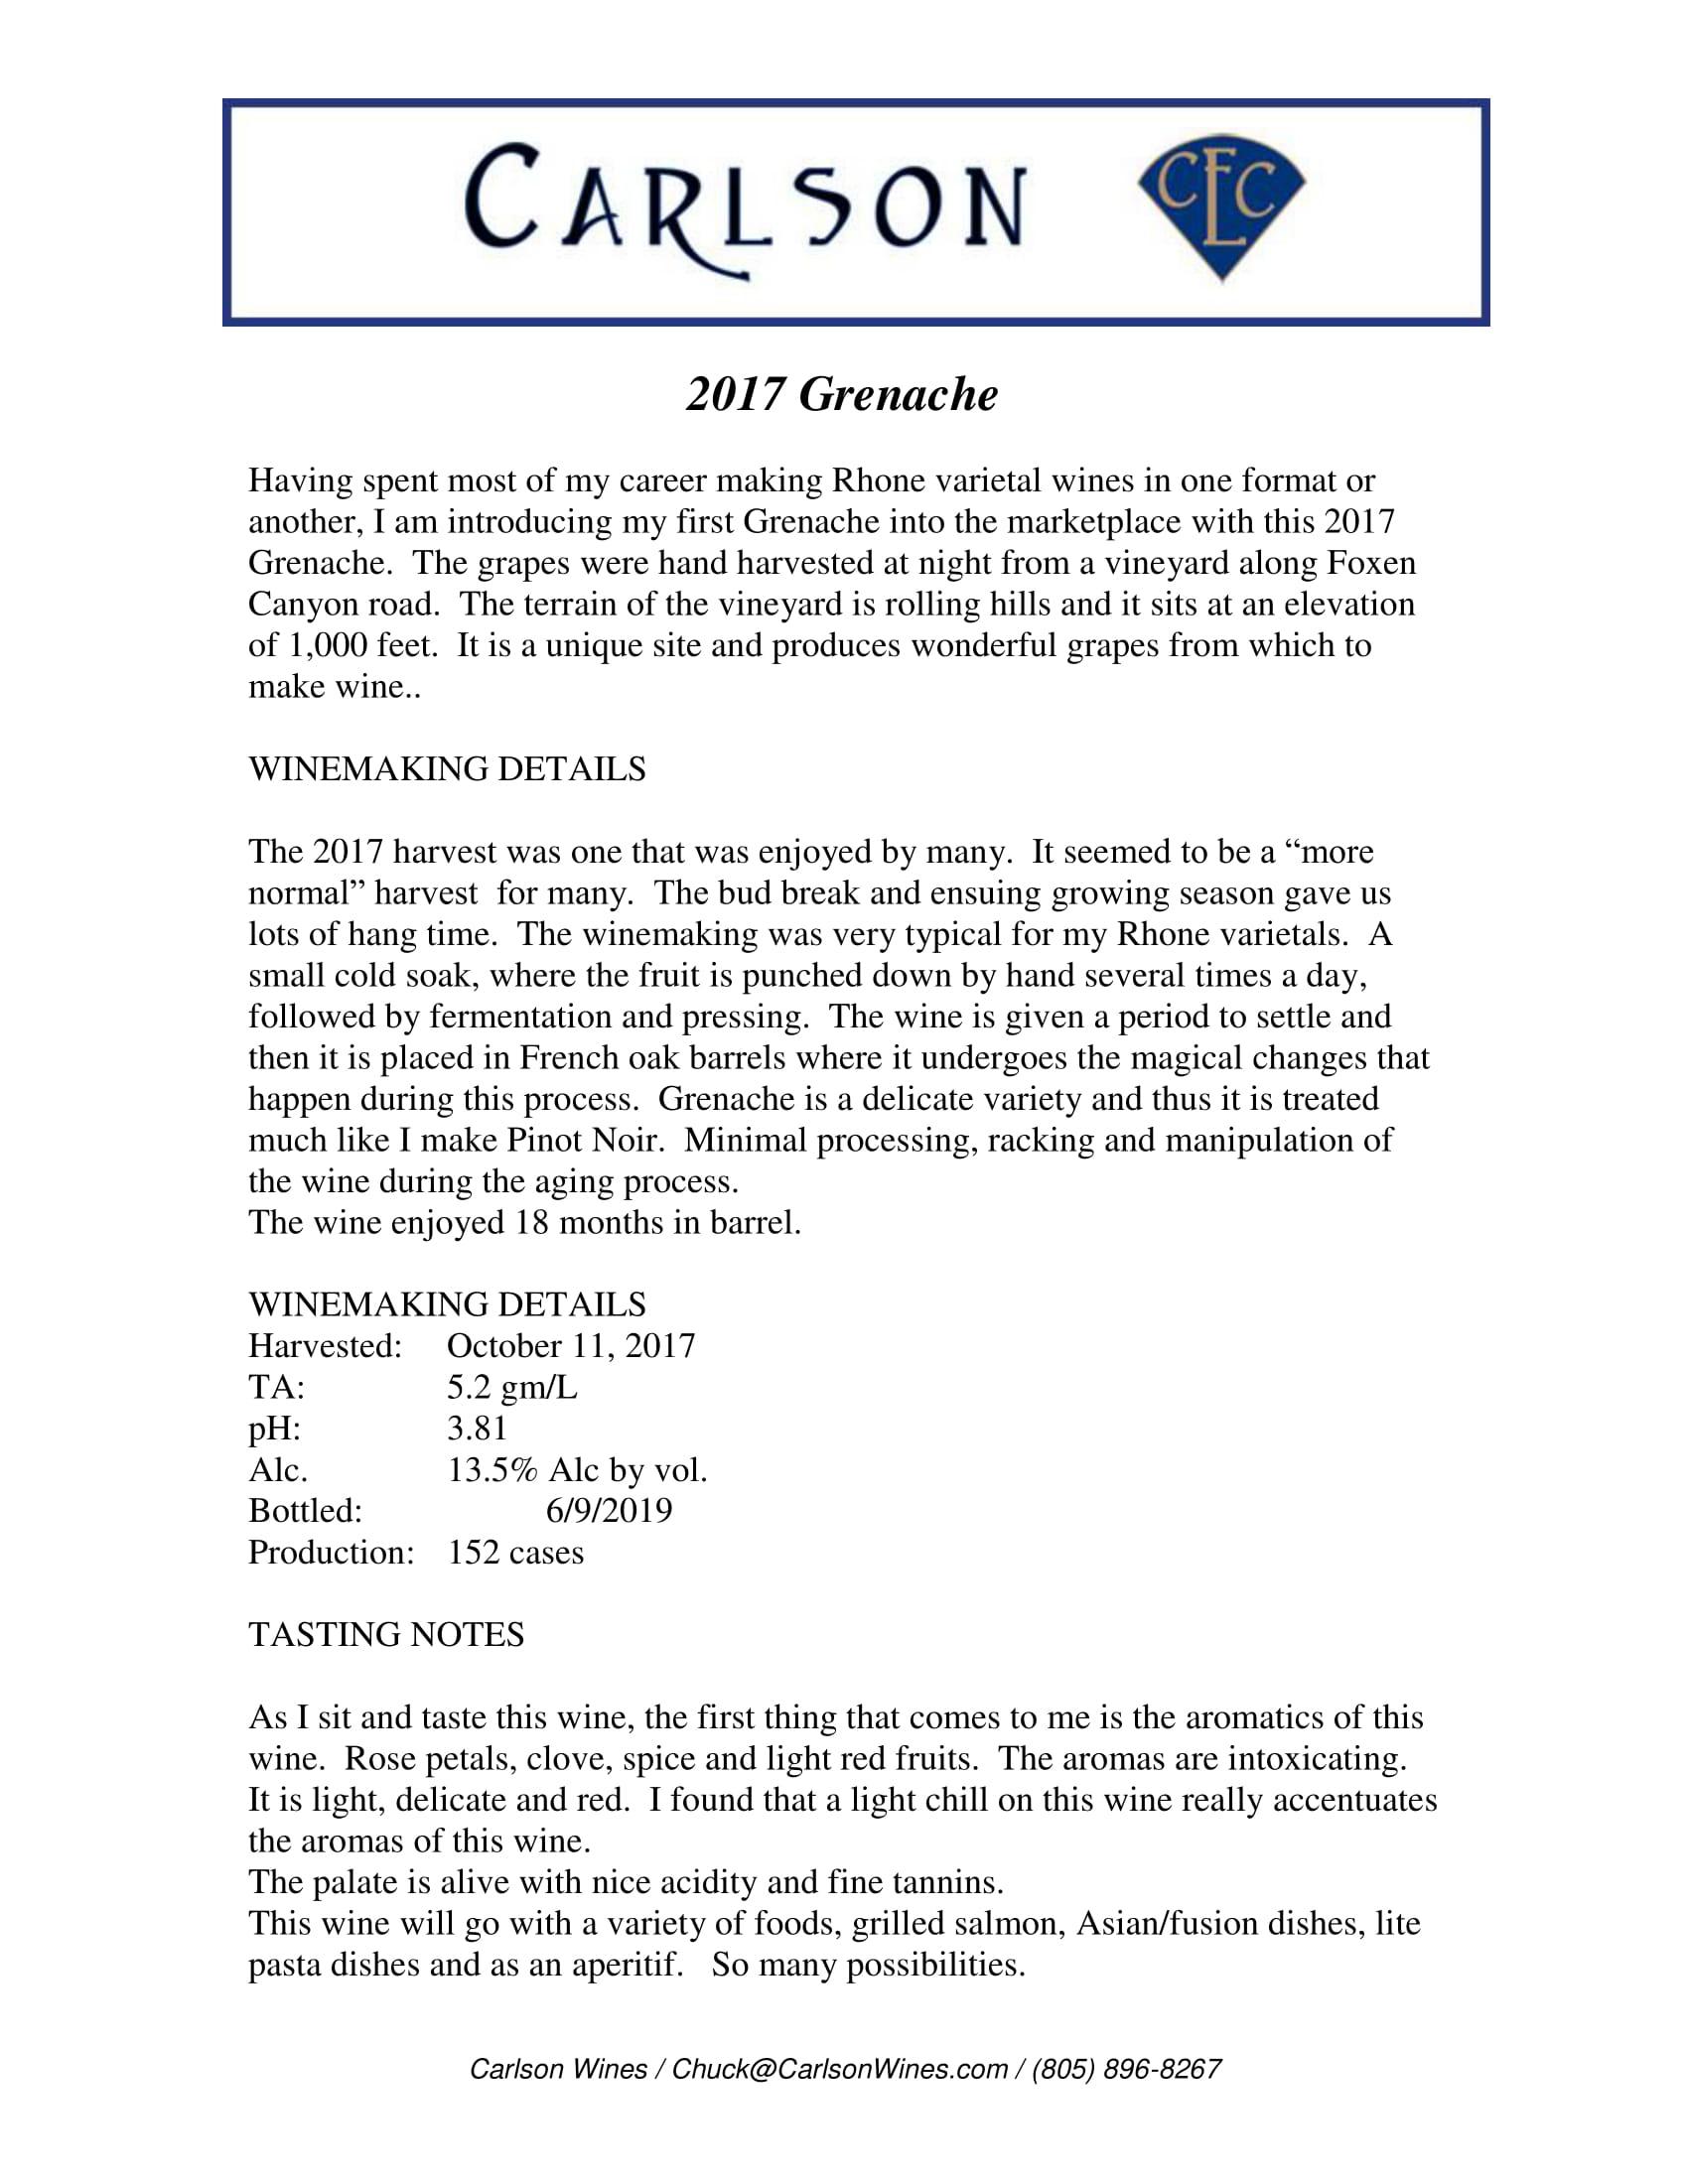 Carlson Grenache Tech Sheet